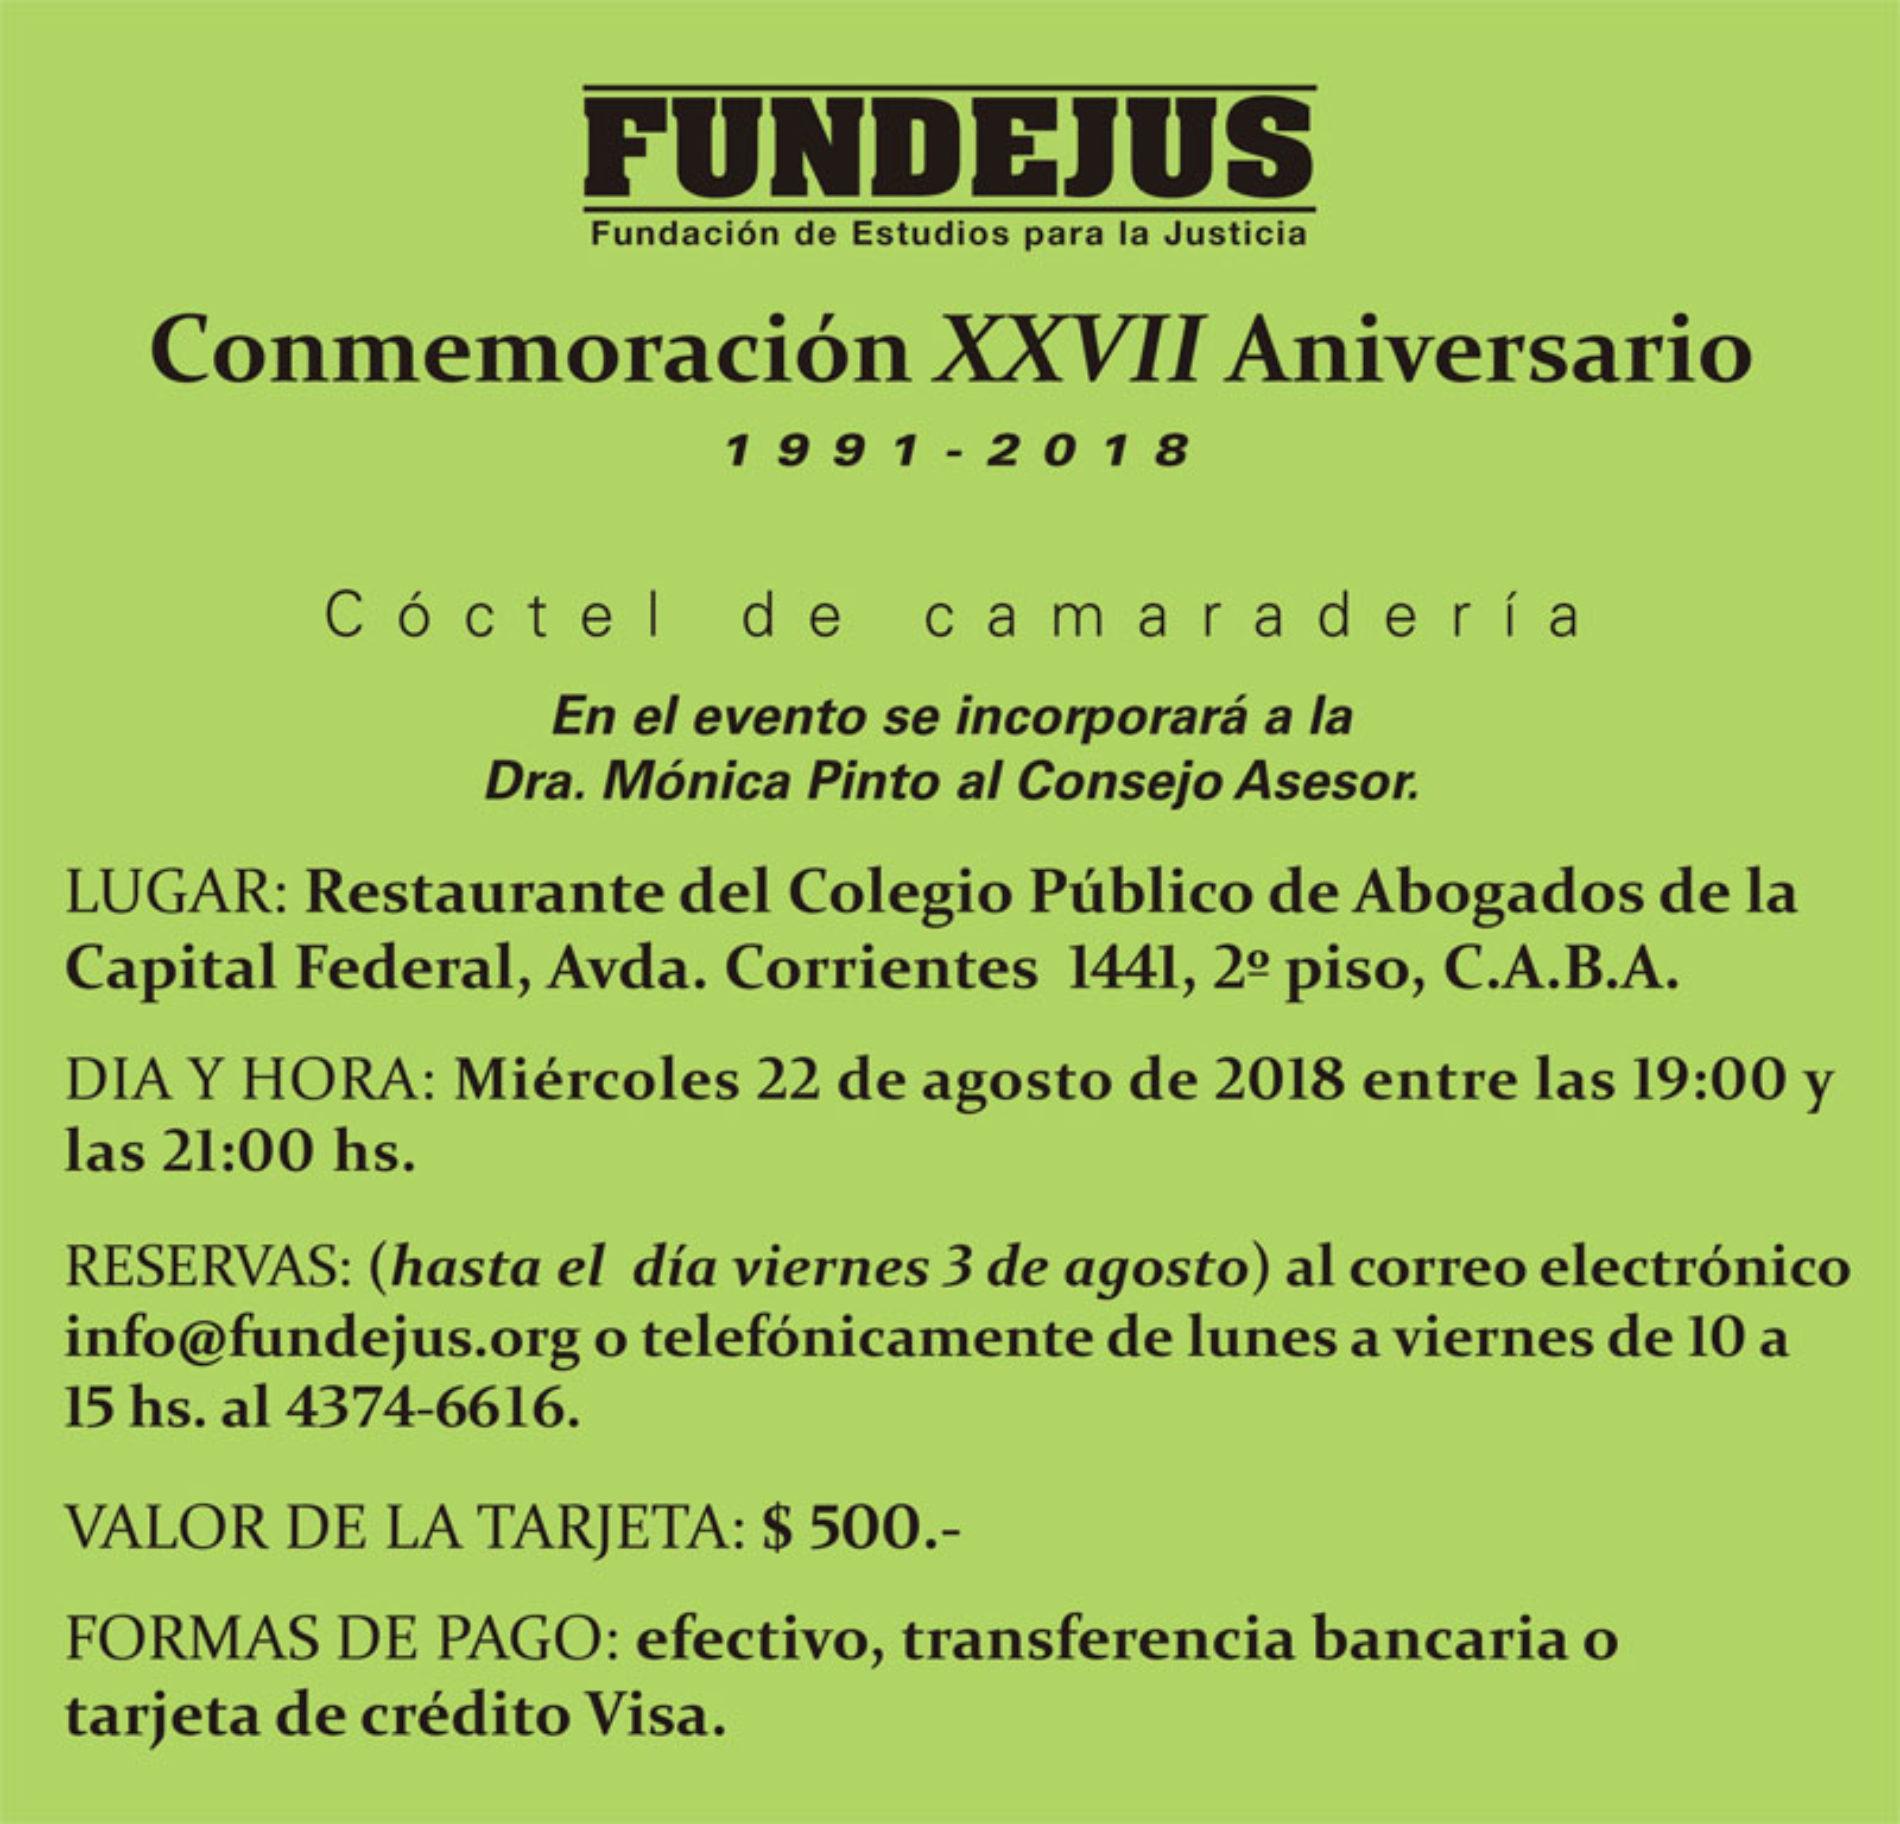 «Conmemoración XXVII Aniversario». Cambio de fecha.